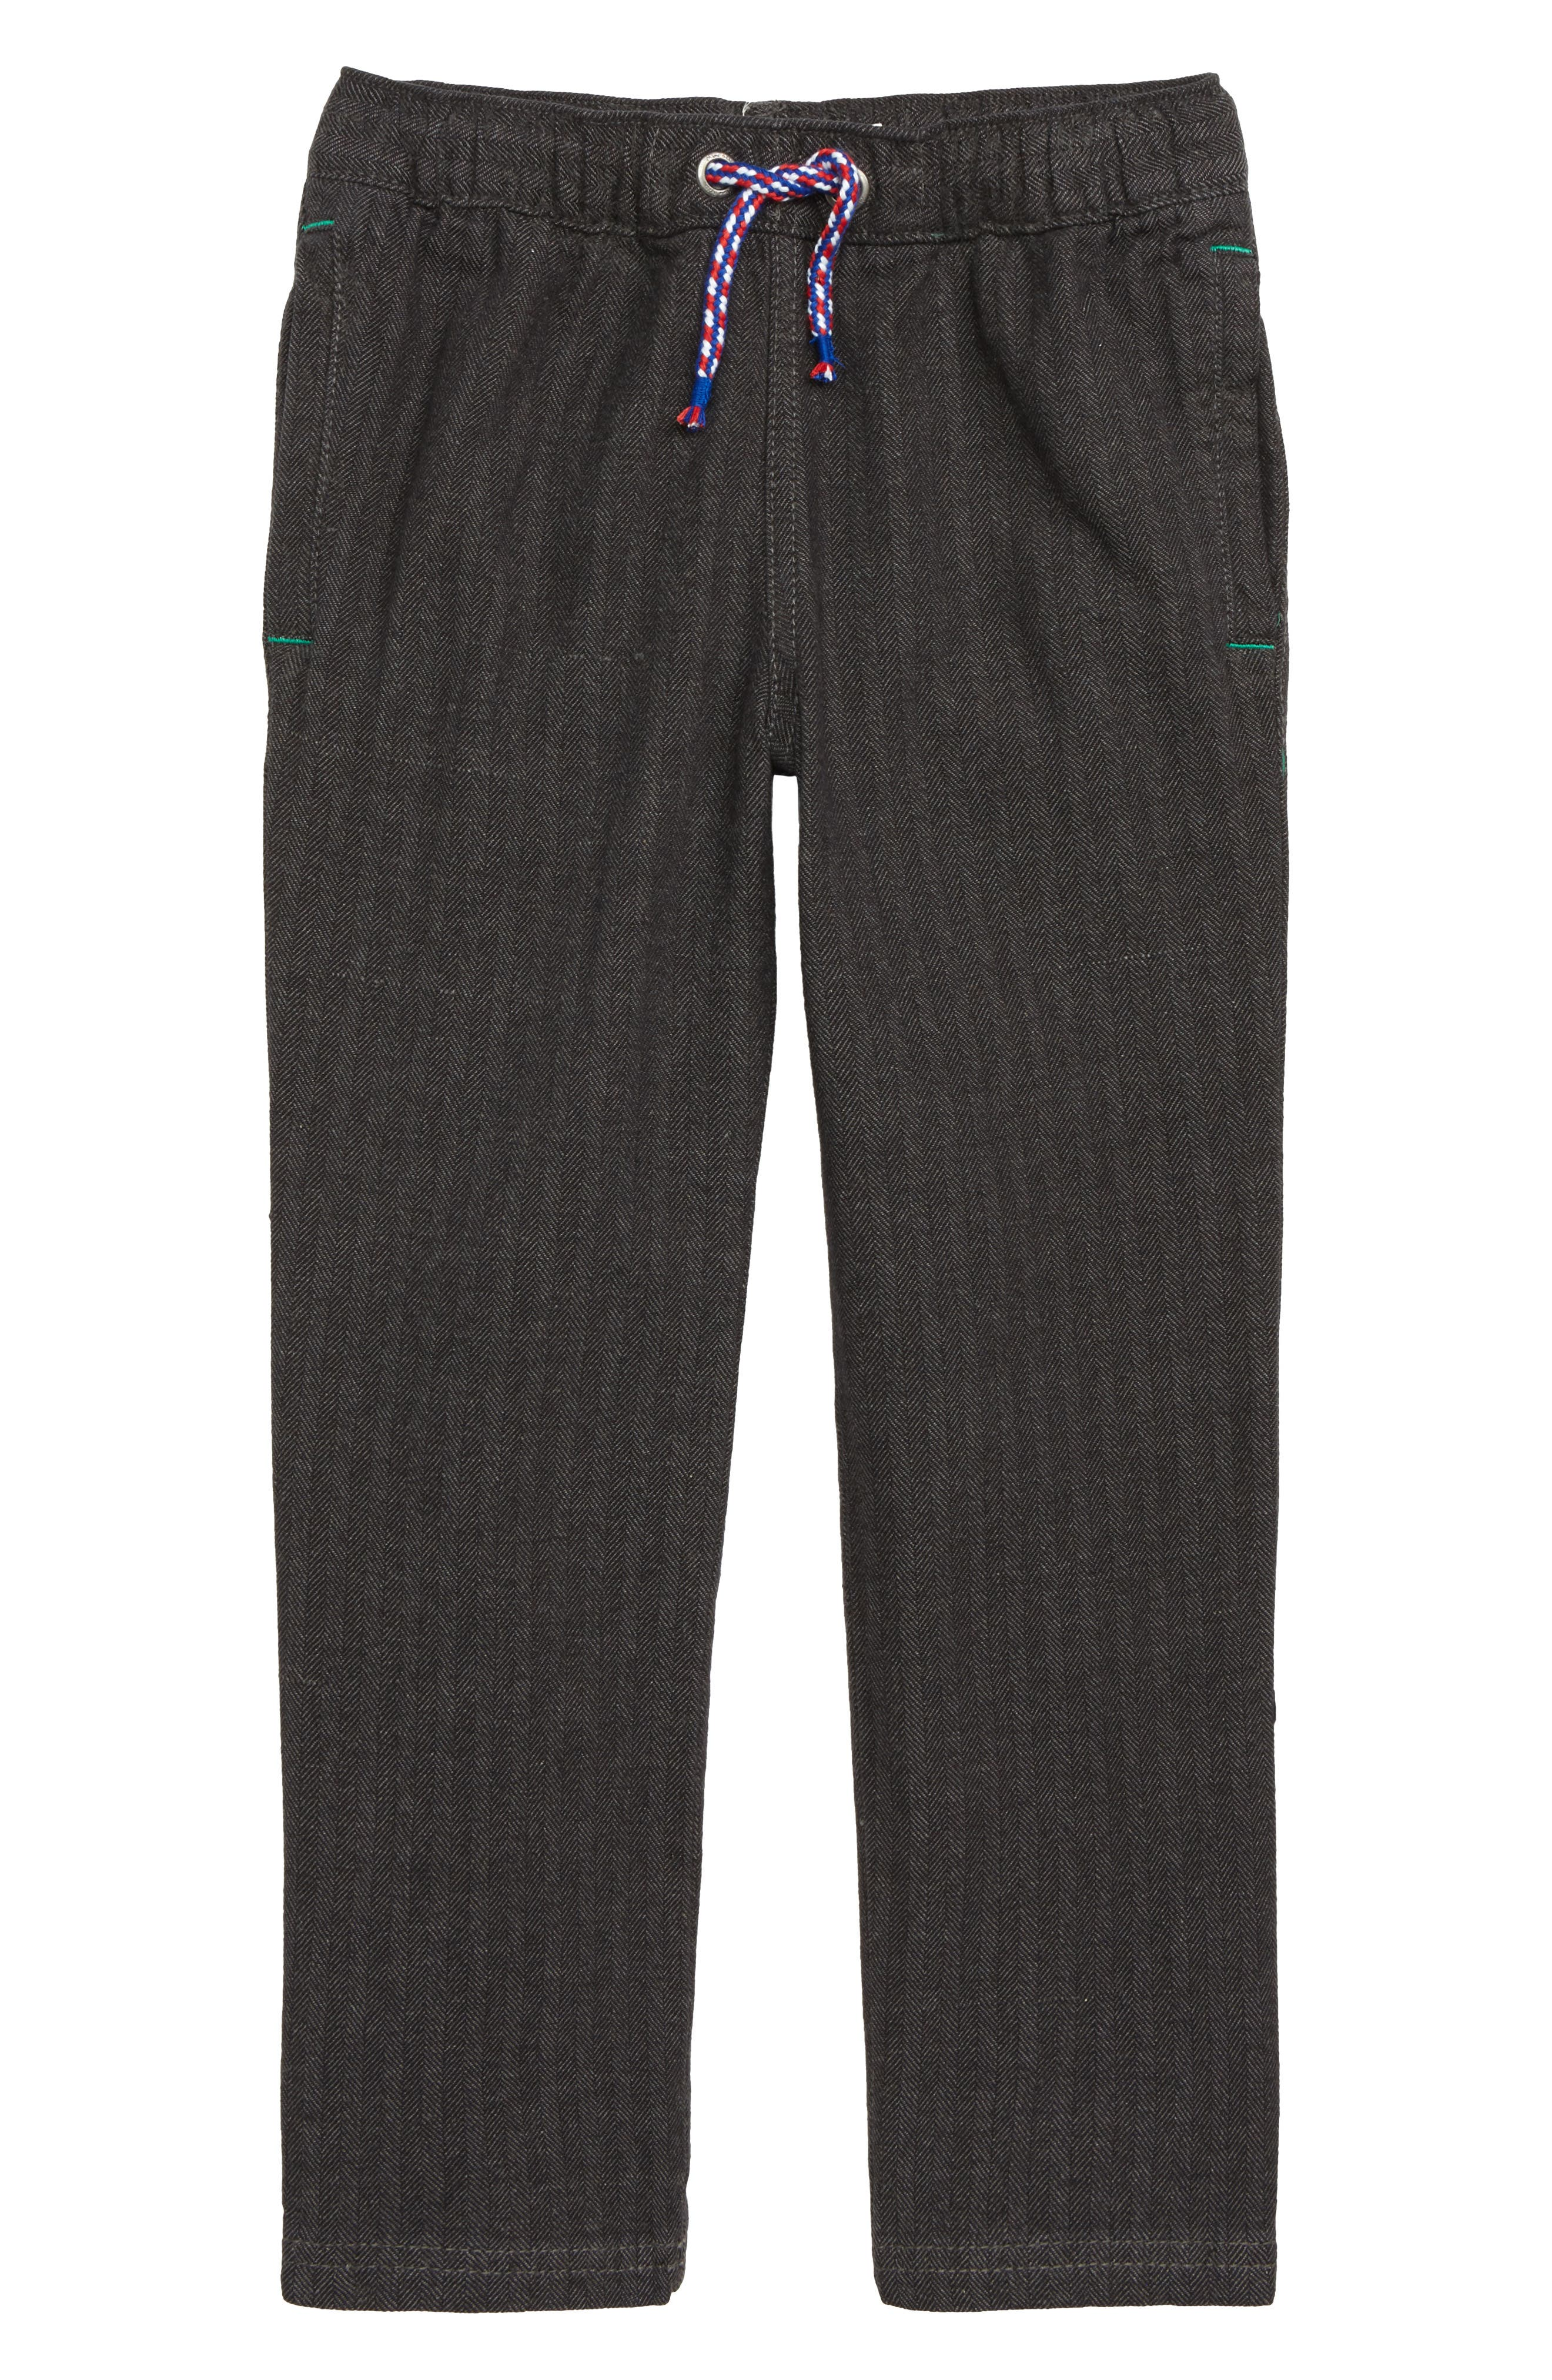 Smart Pull-On Pants,                             Main thumbnail 1, color,                             GRY GREY HERRINGBONE